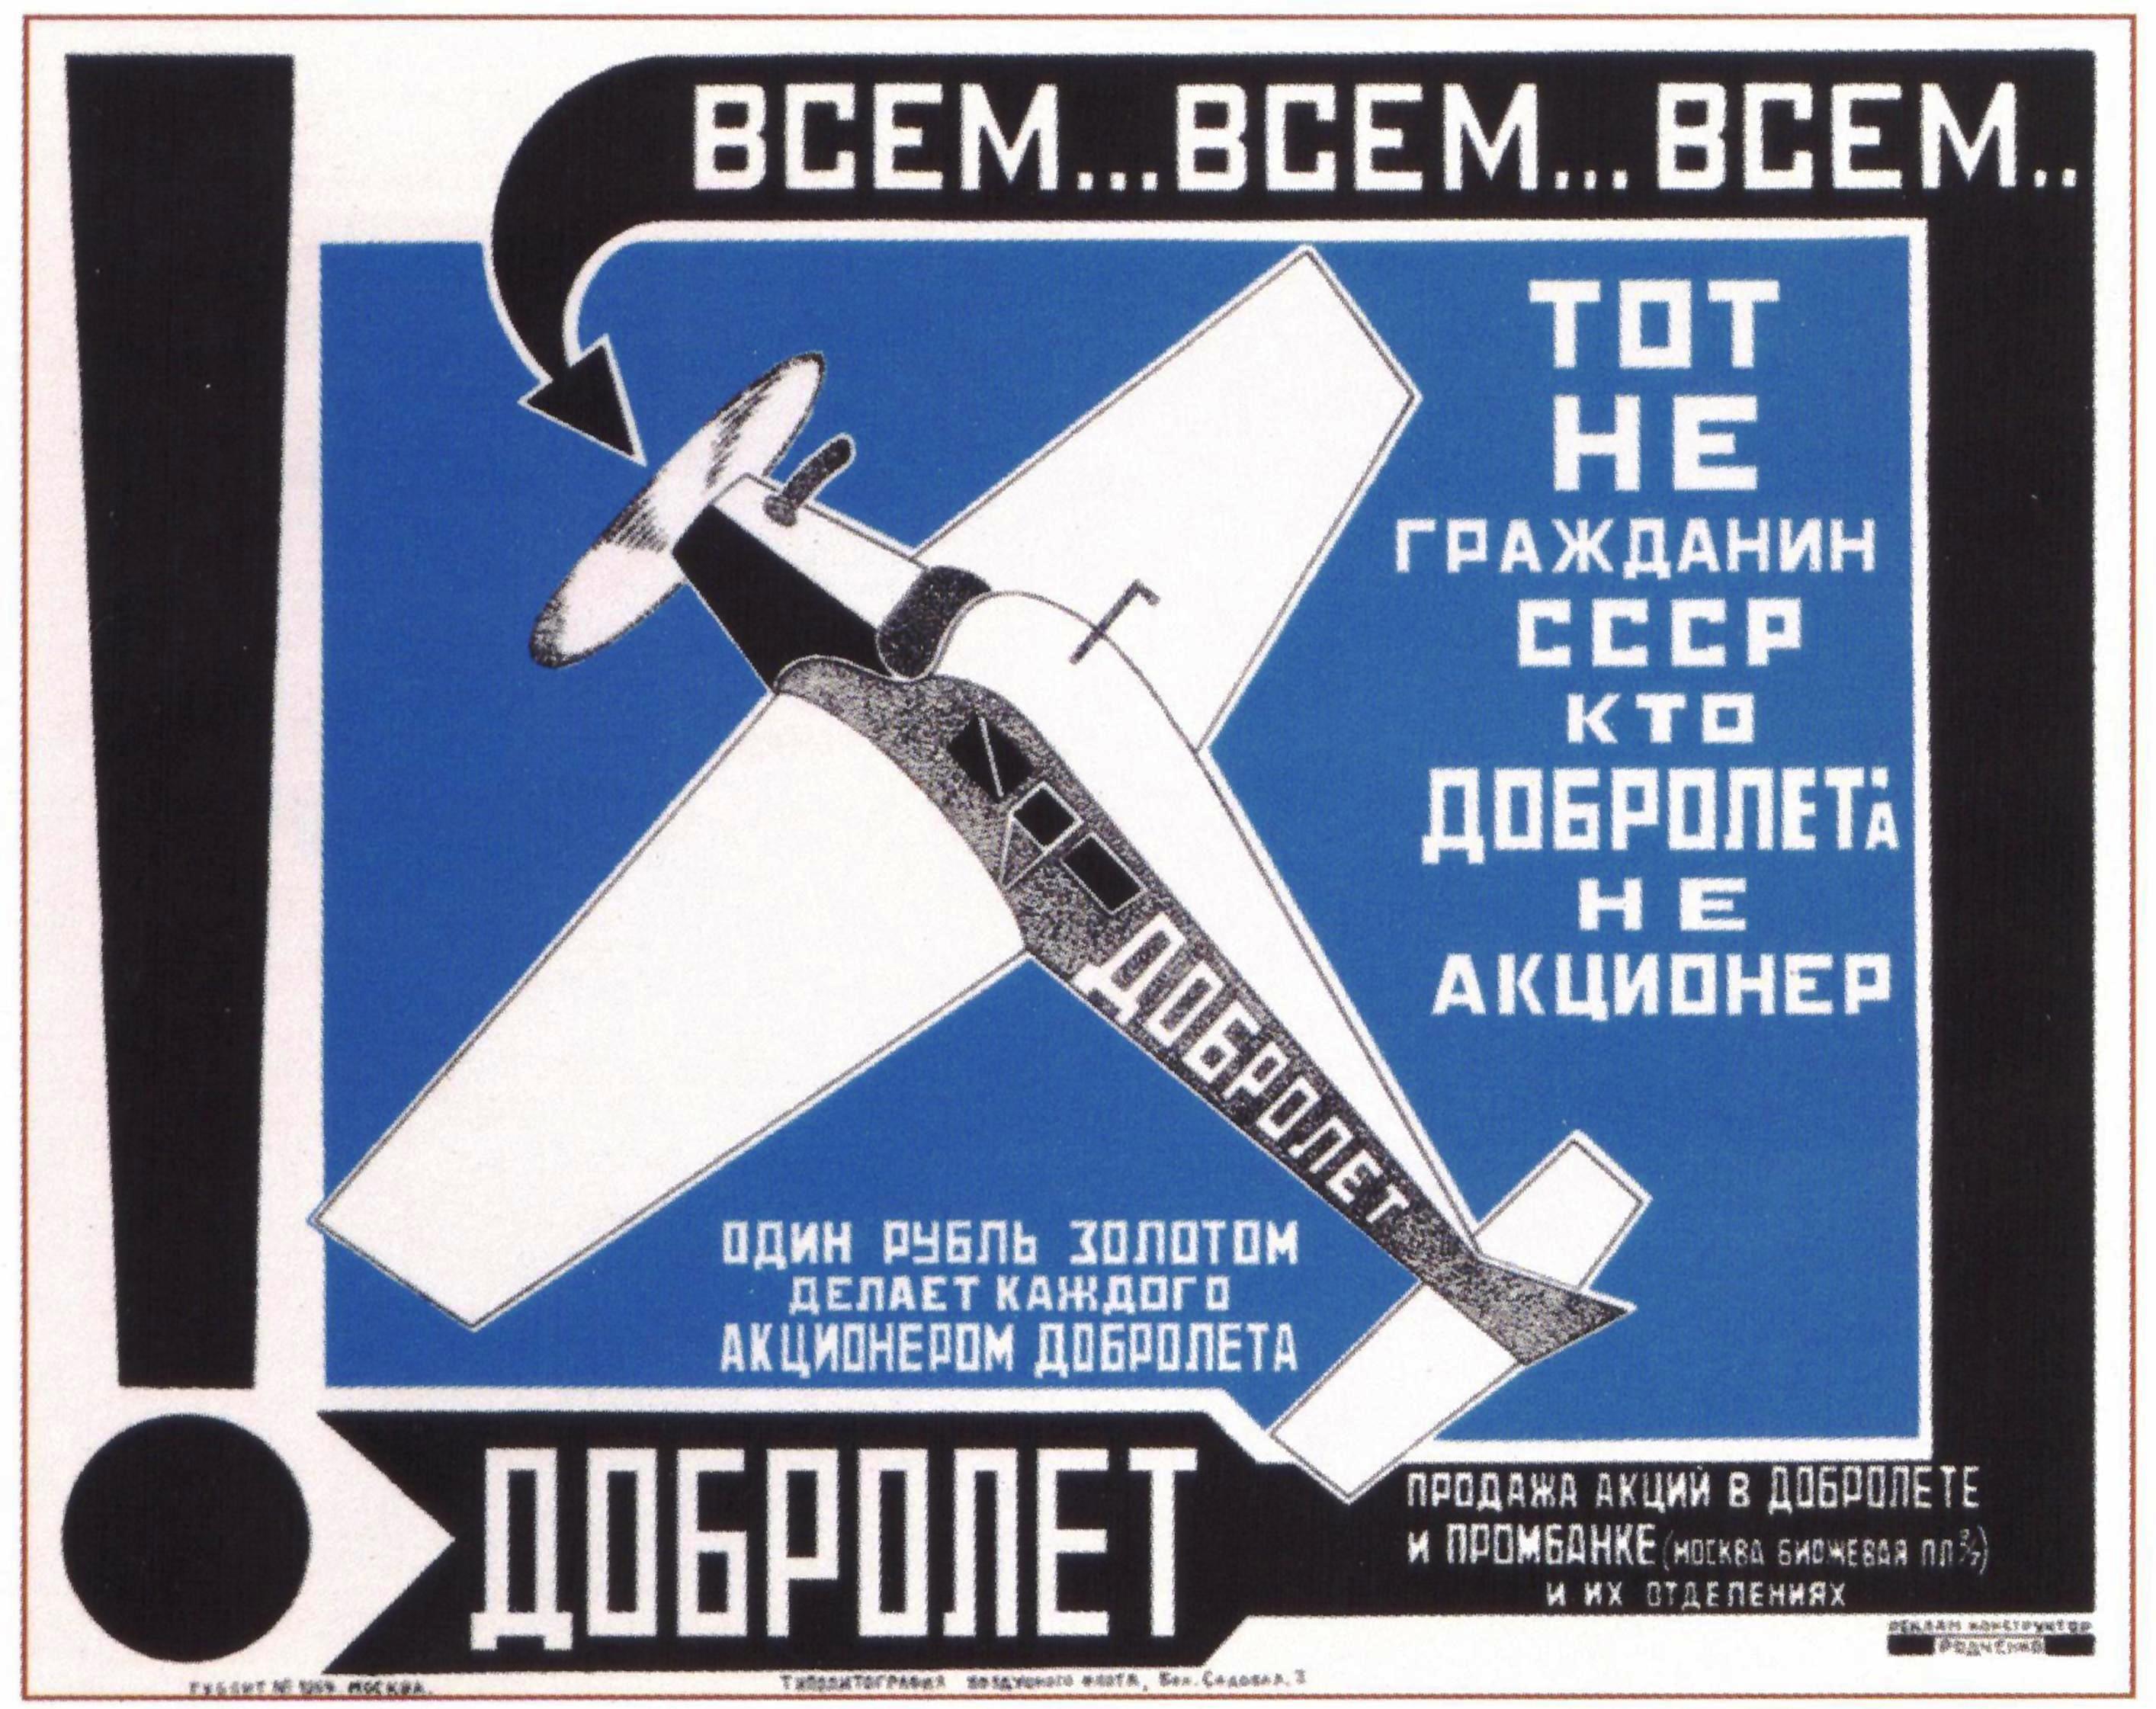 01 Реклама Добролёта, 1923 год. Автор текста и художник - Александр Родченко